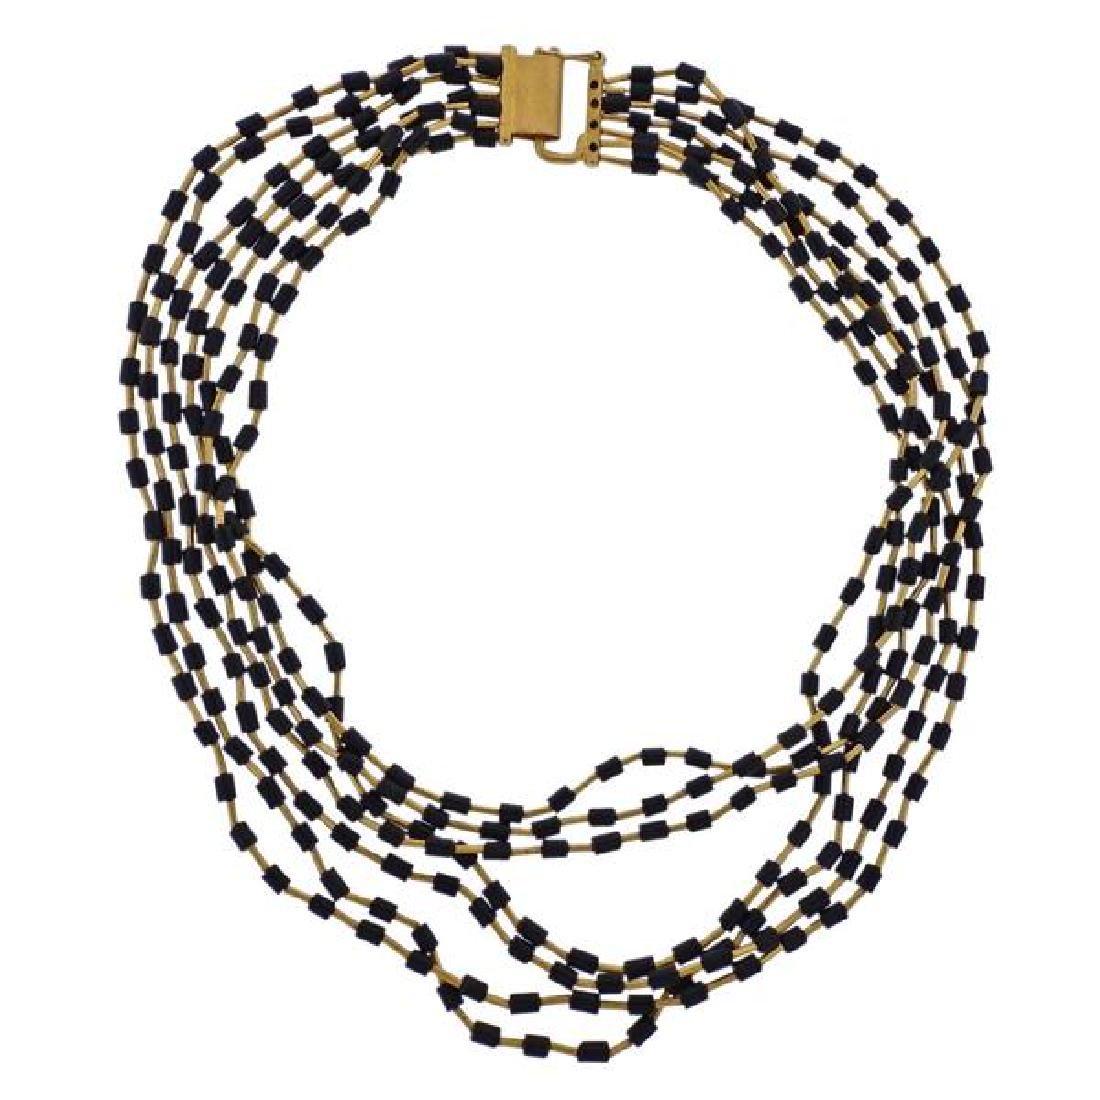 Yossi Harari 24k Gold Jet Bead Multi Strand Necklace